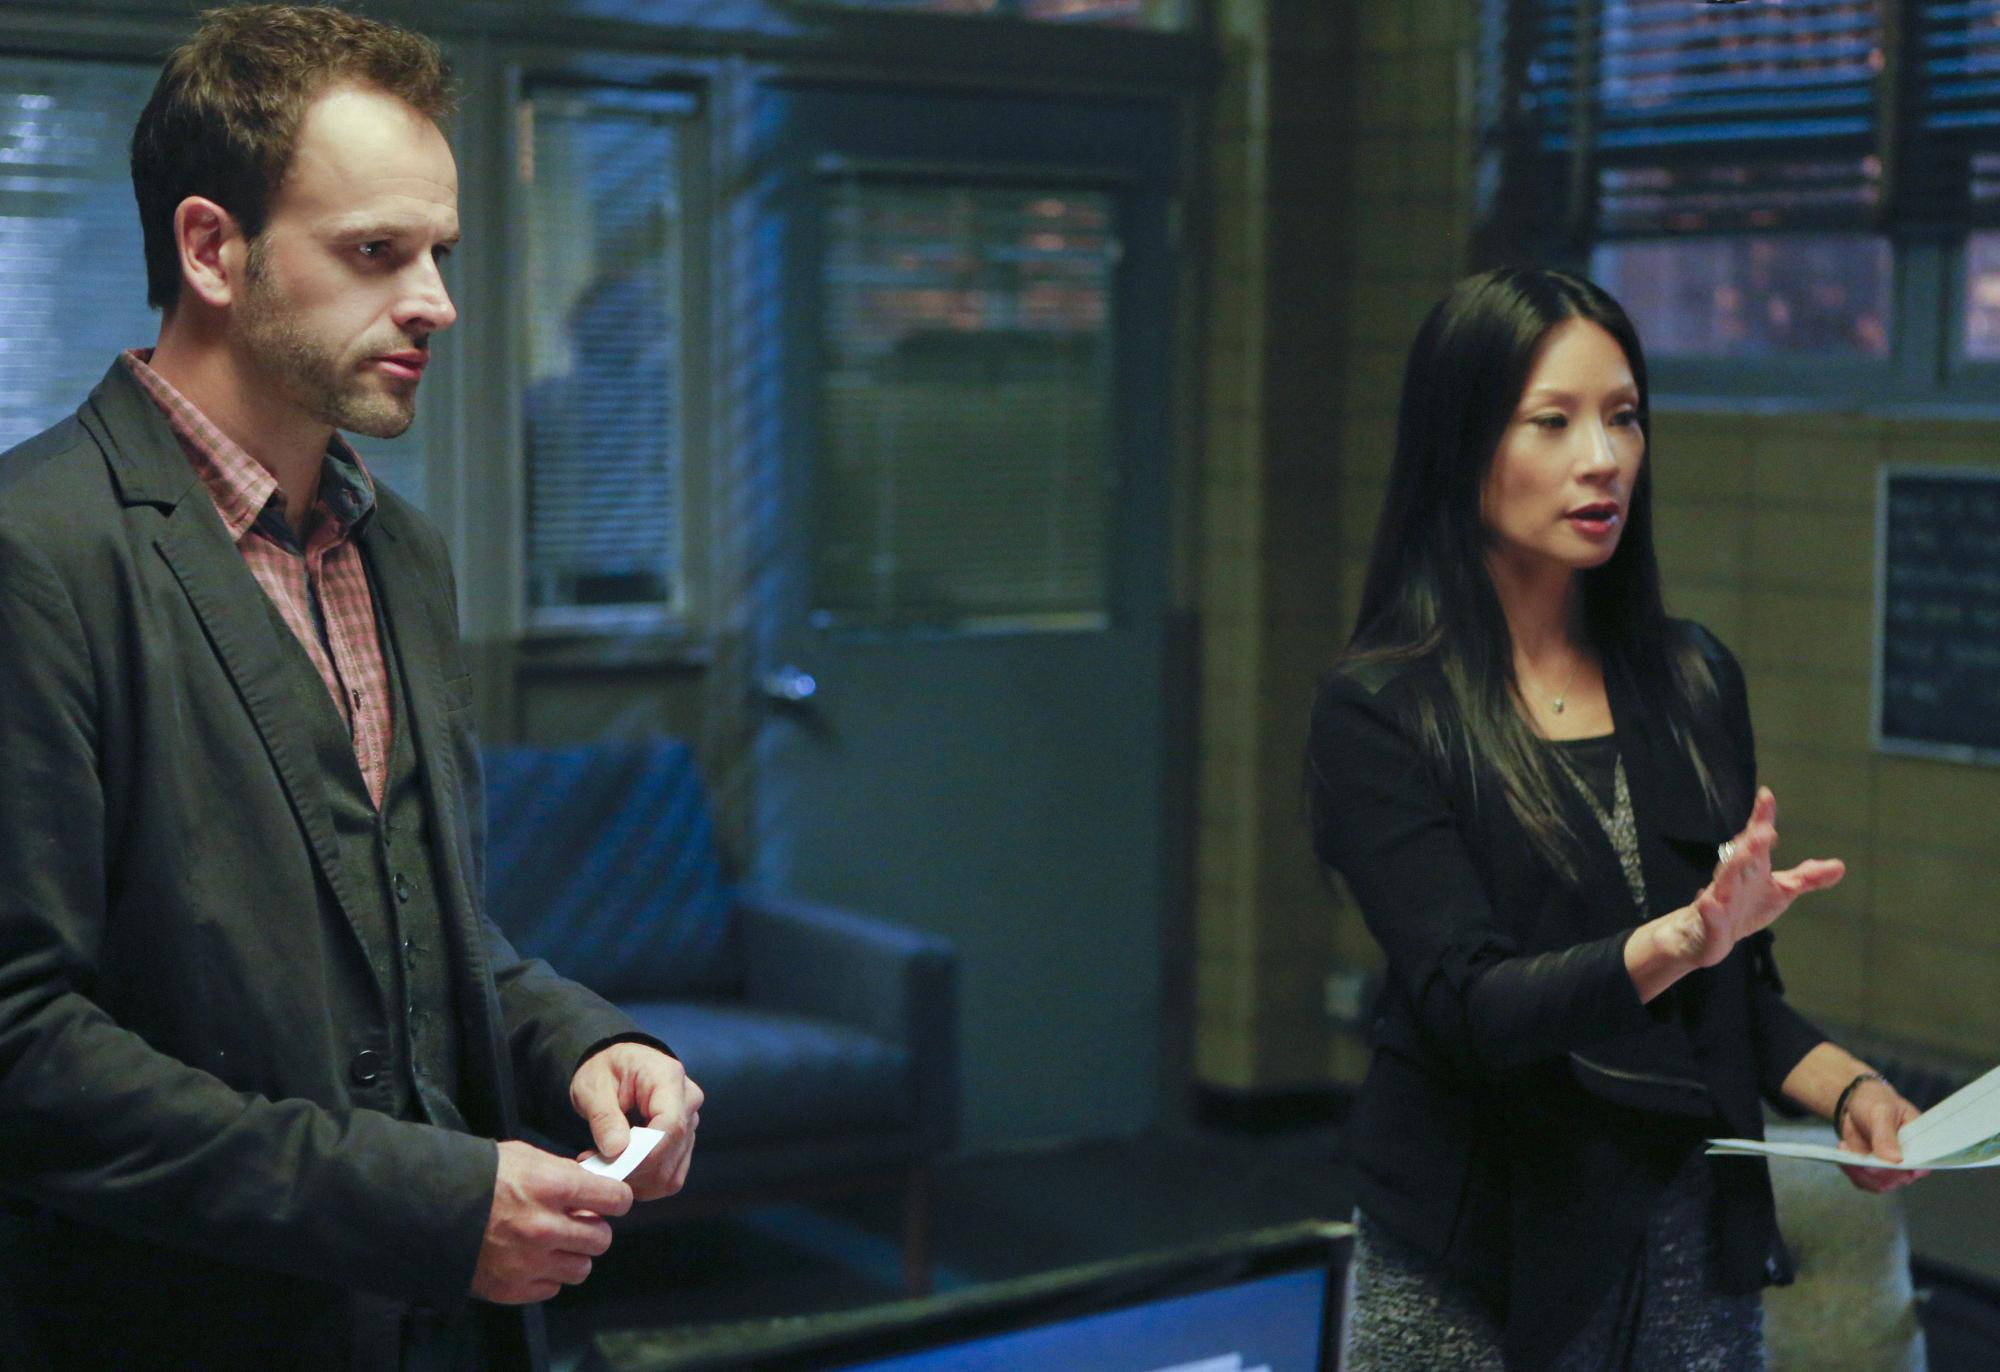 Sherlock and Watson Investigate a Murder Case